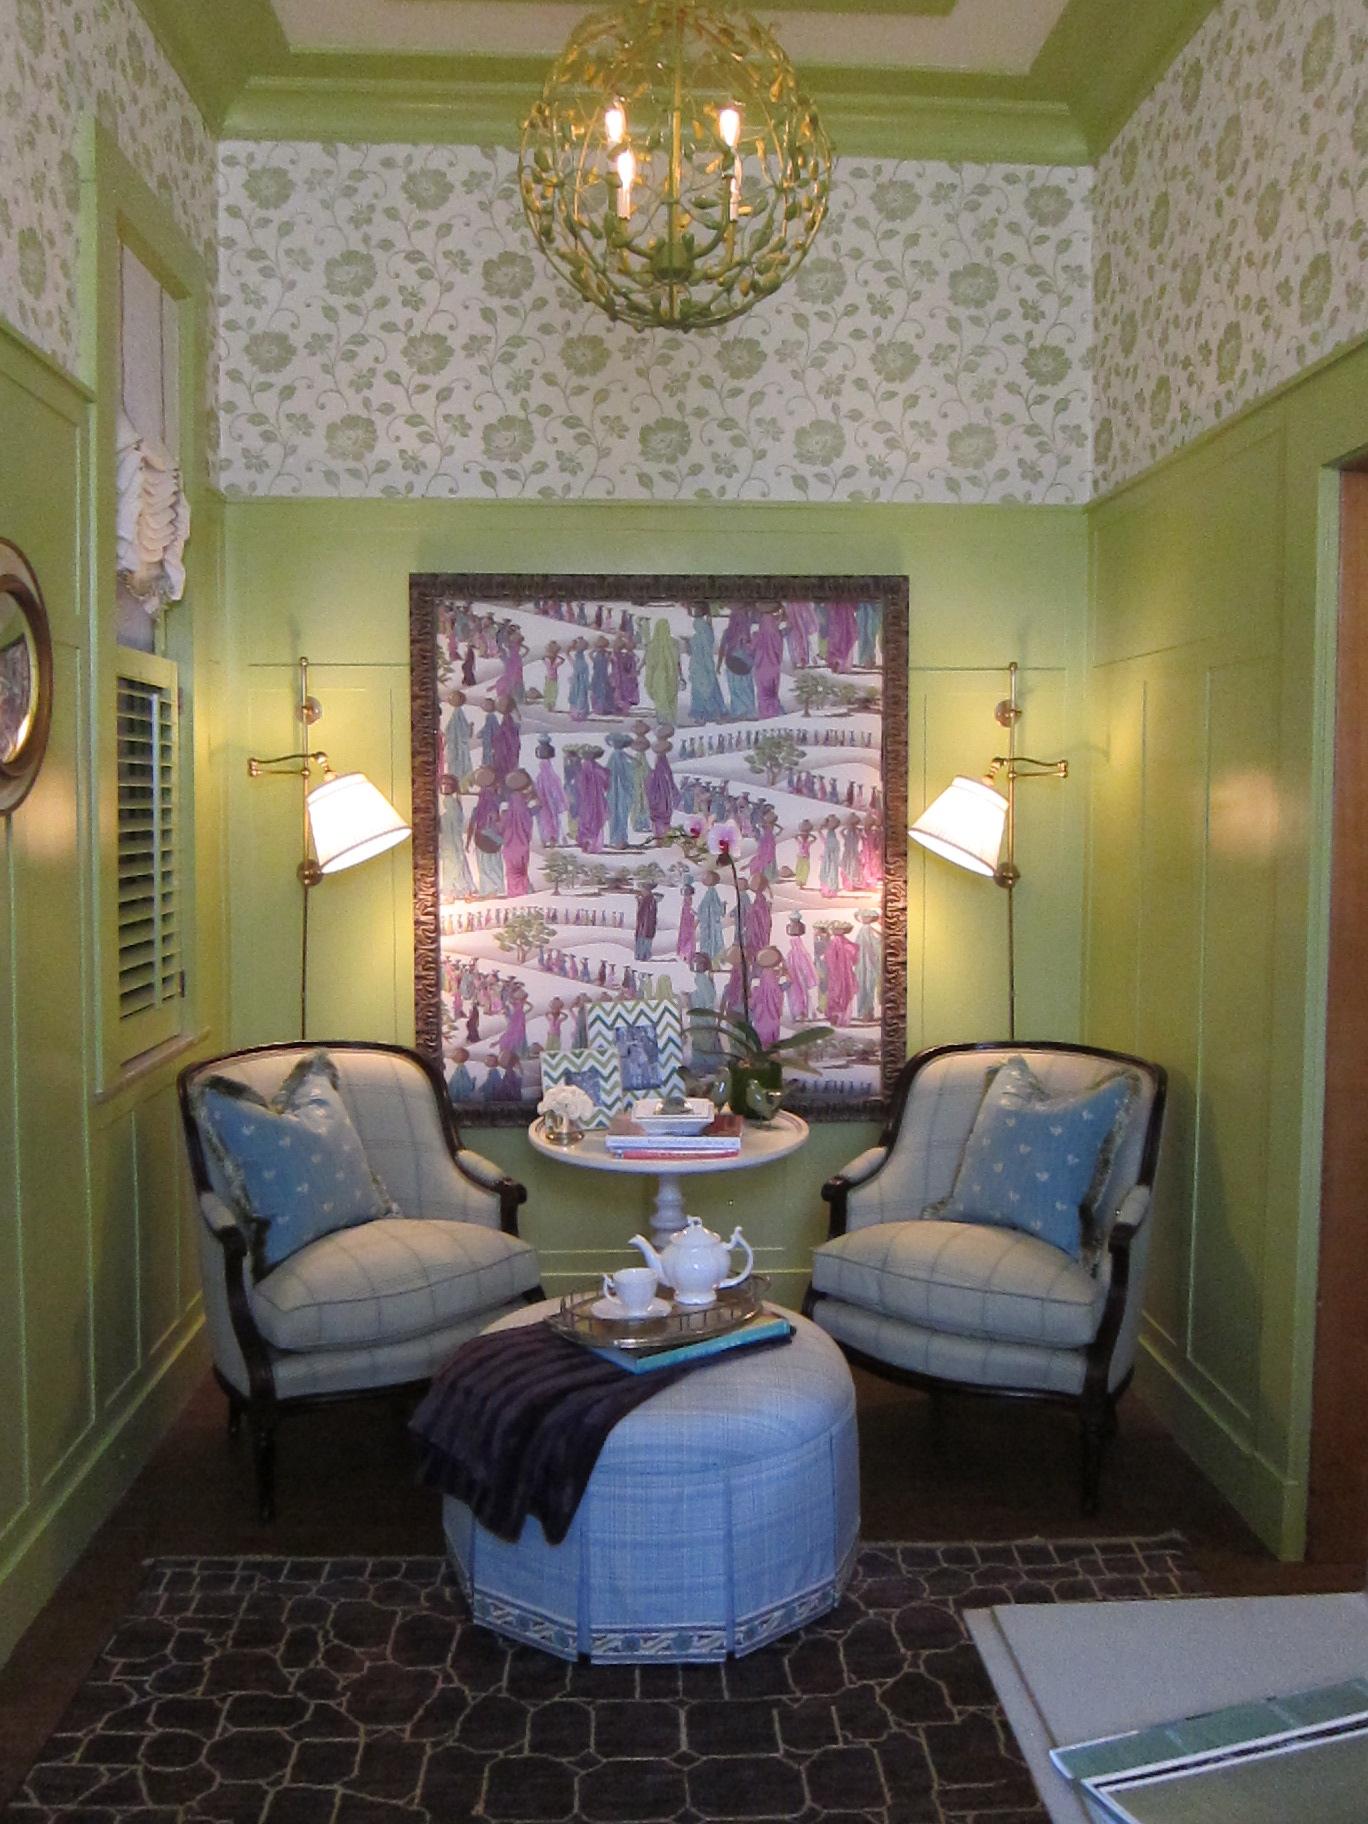 Elizabeth Benedict The Green Room - JLB Show House 2012